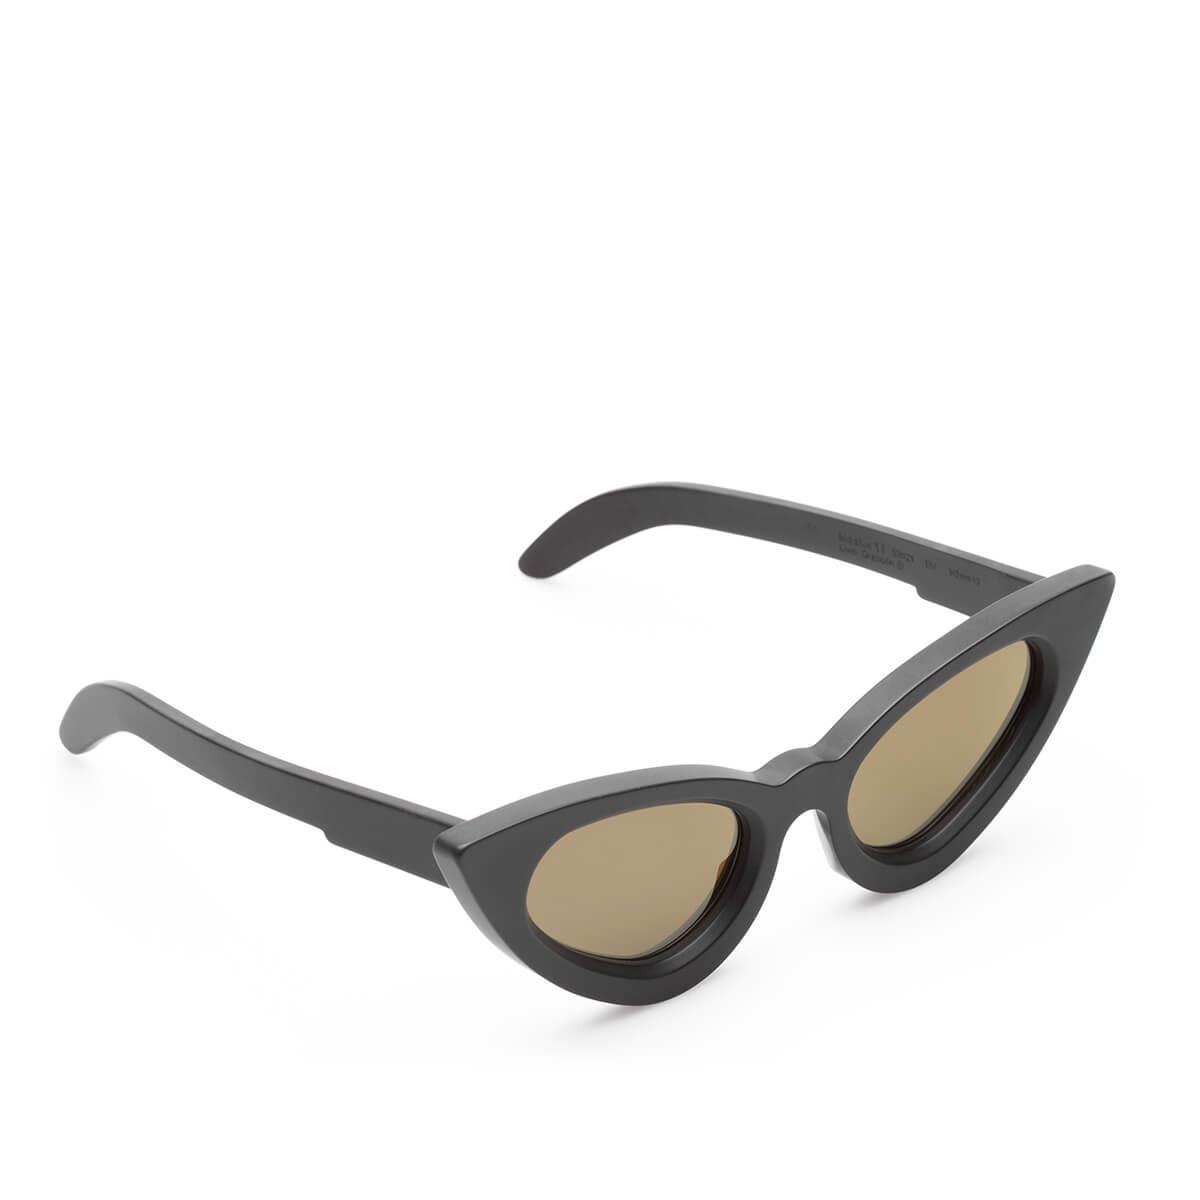 33de4287ade Kuboraum - Black Y3 Bm Sunglasses for Men - Lyst. View fullscreen